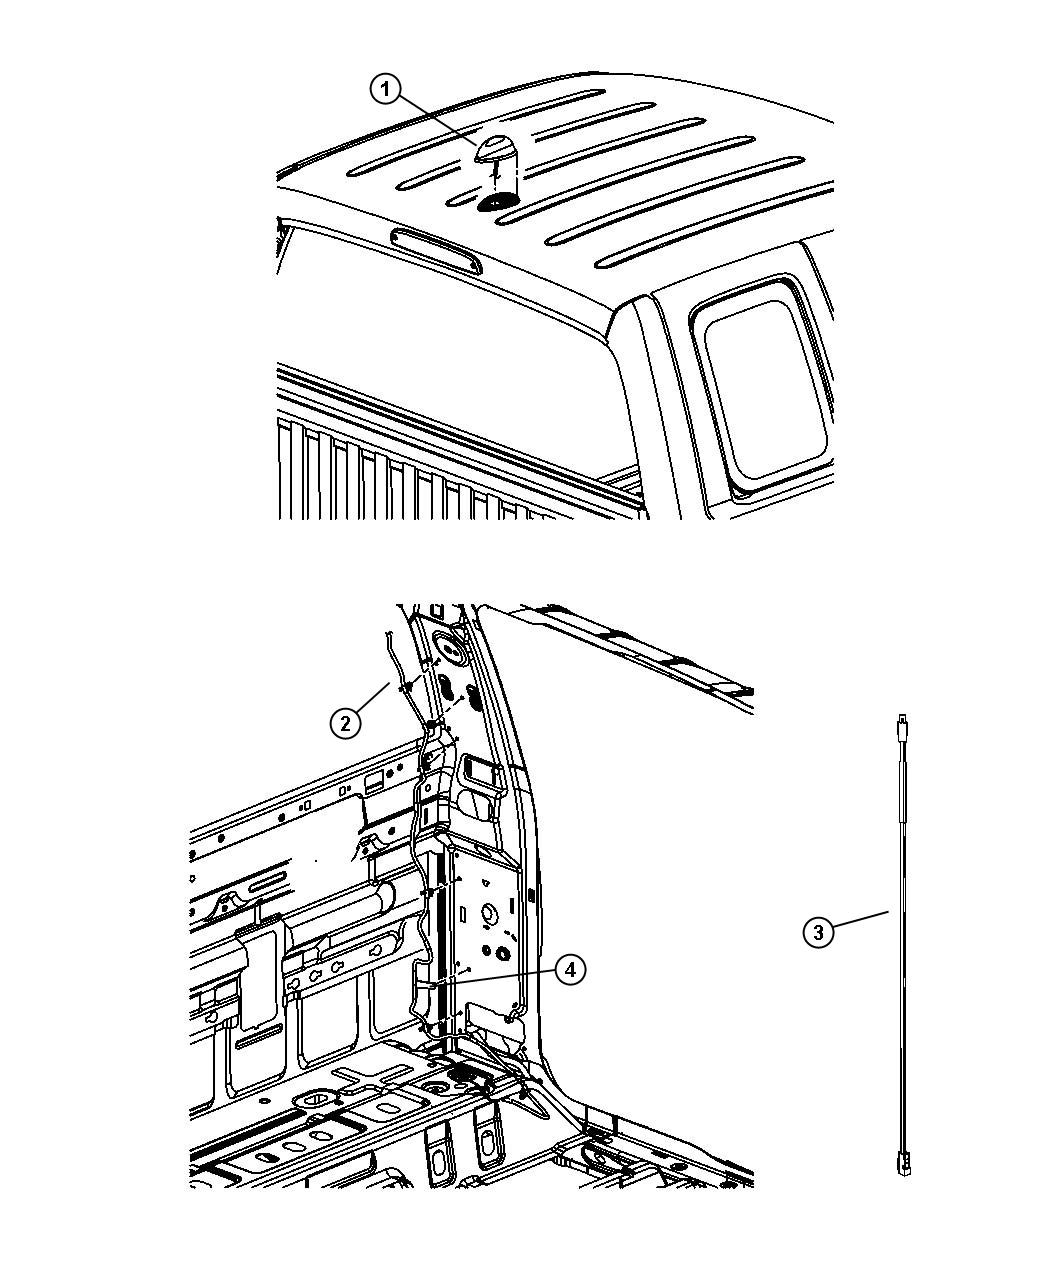 Dodge Caravan Antenna Satellite Radioaero Streaming